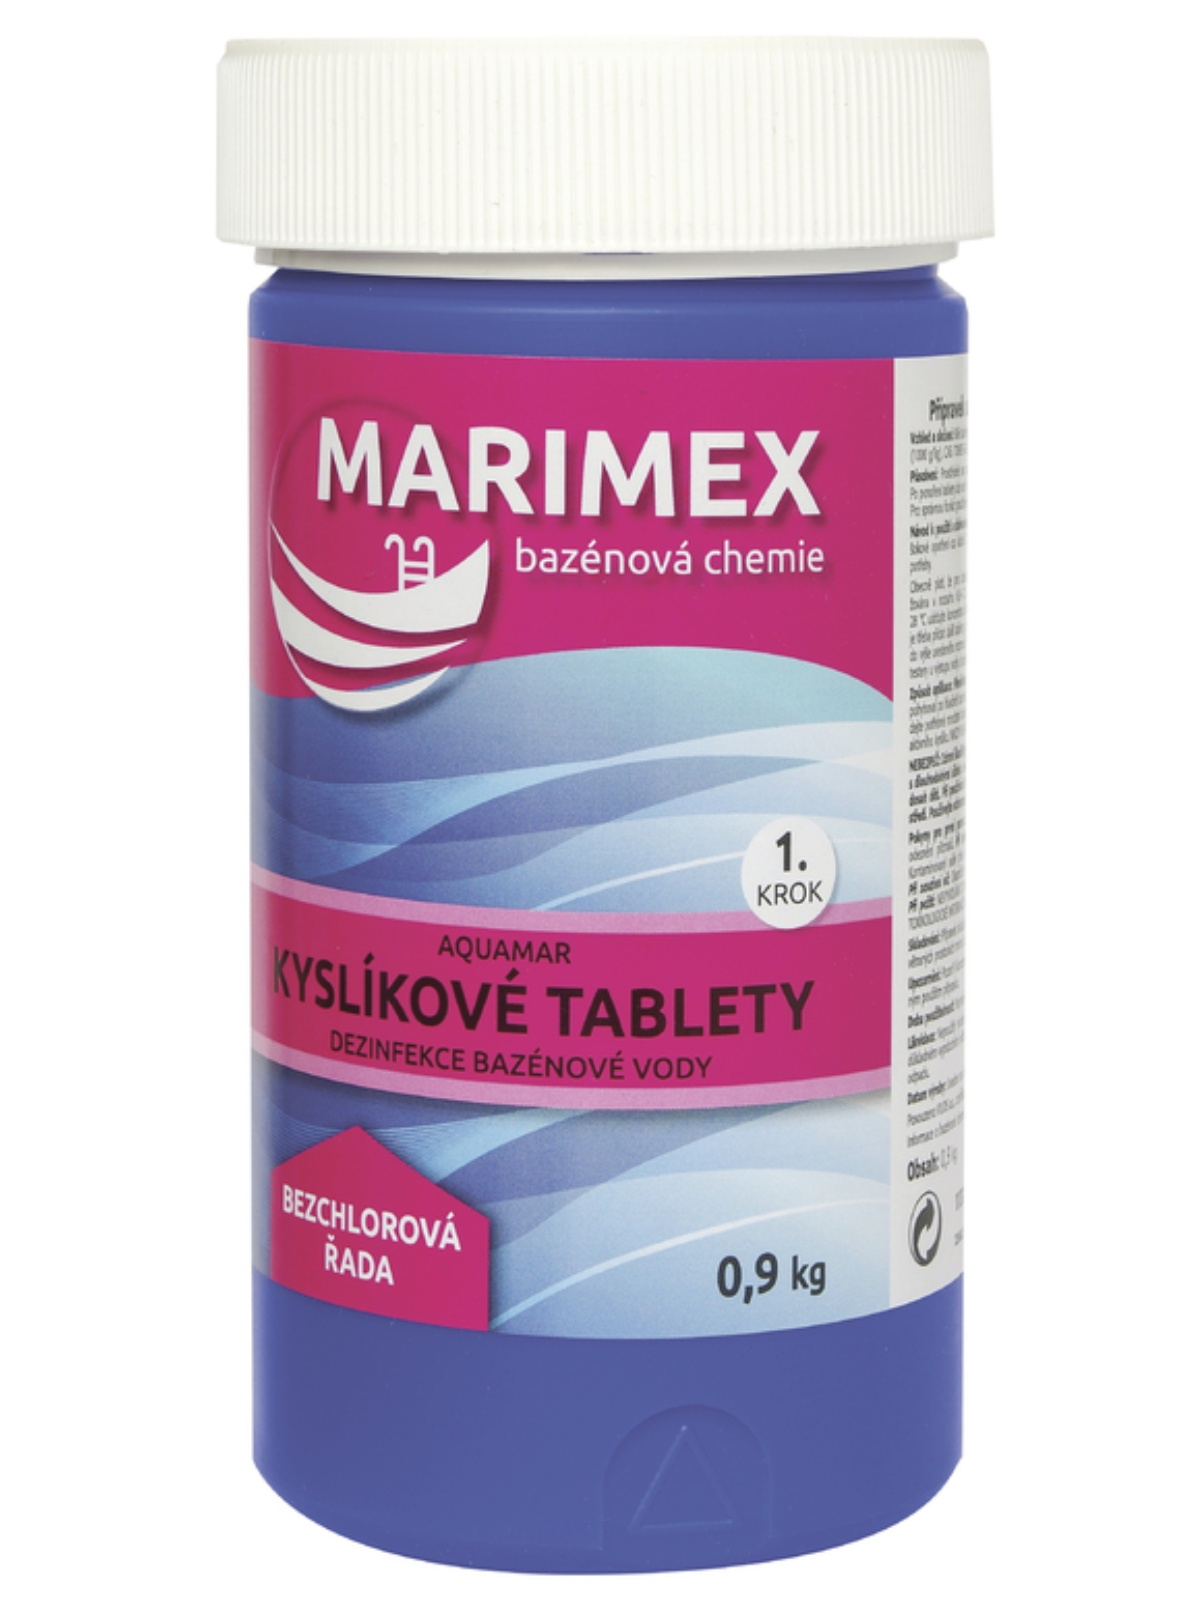 MARIMEX Aquamar Kyslíkové tablety 900g